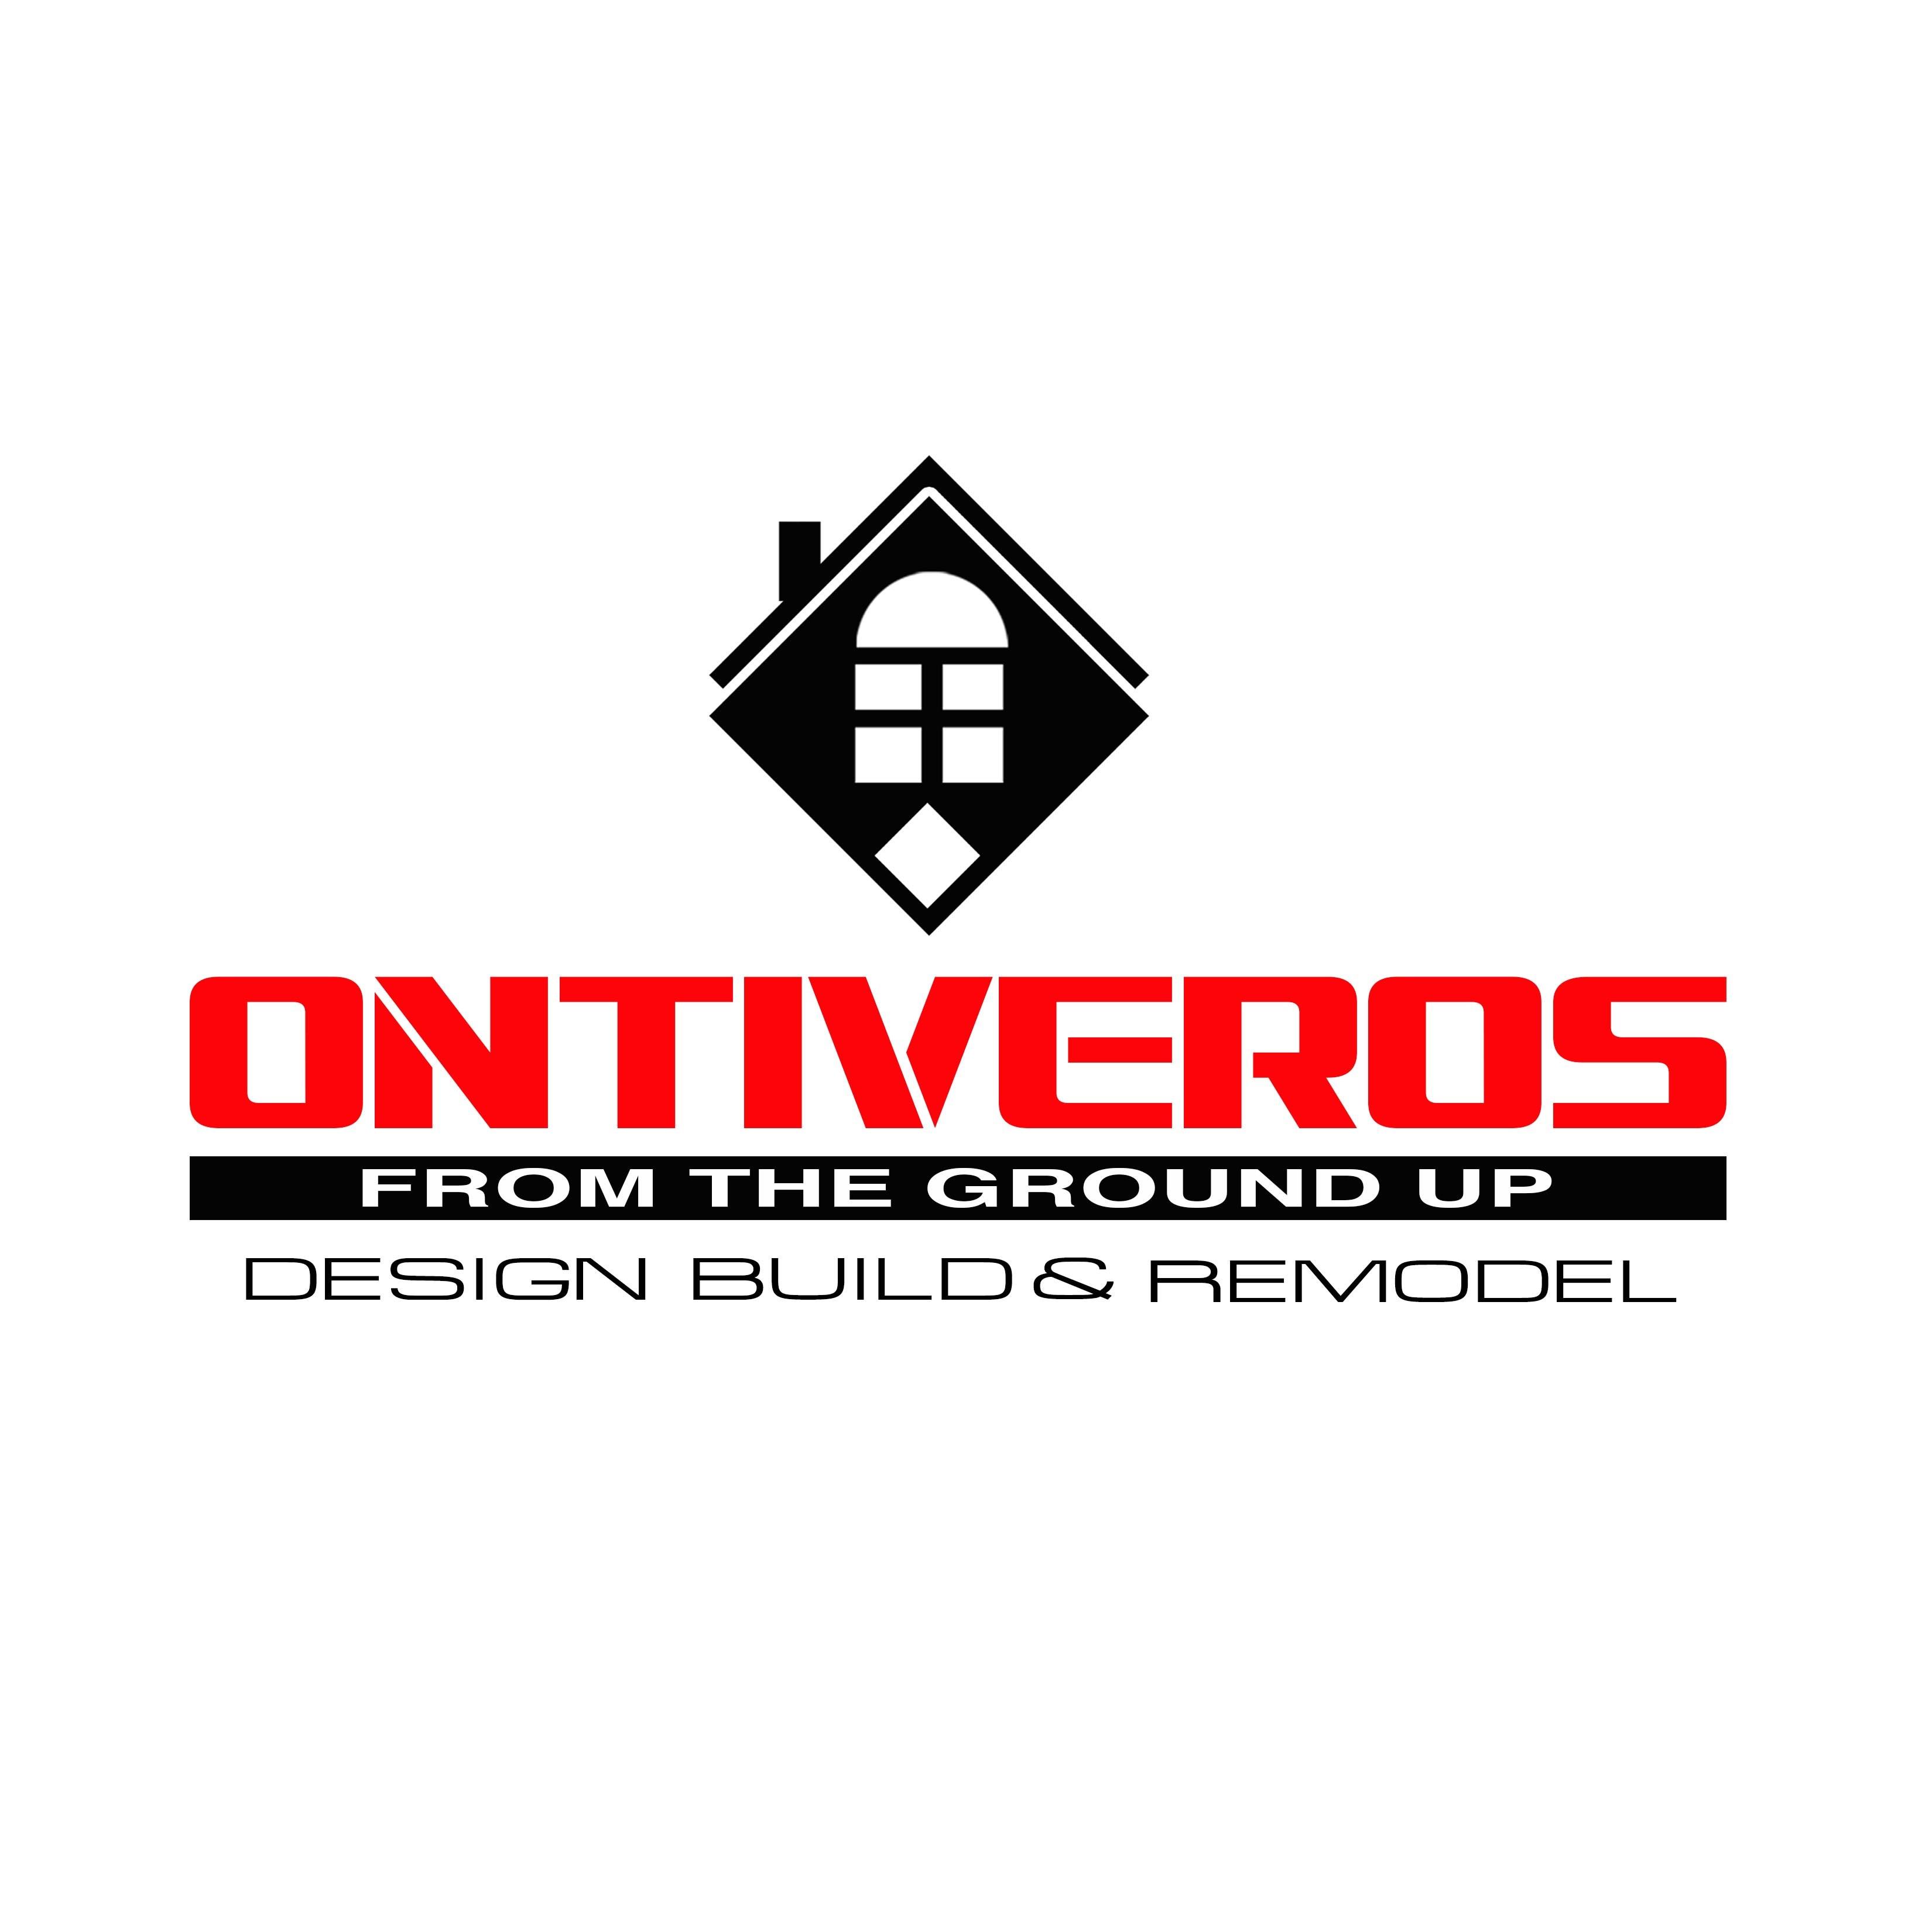 Ontiveros Design Build & Remodel Reviews